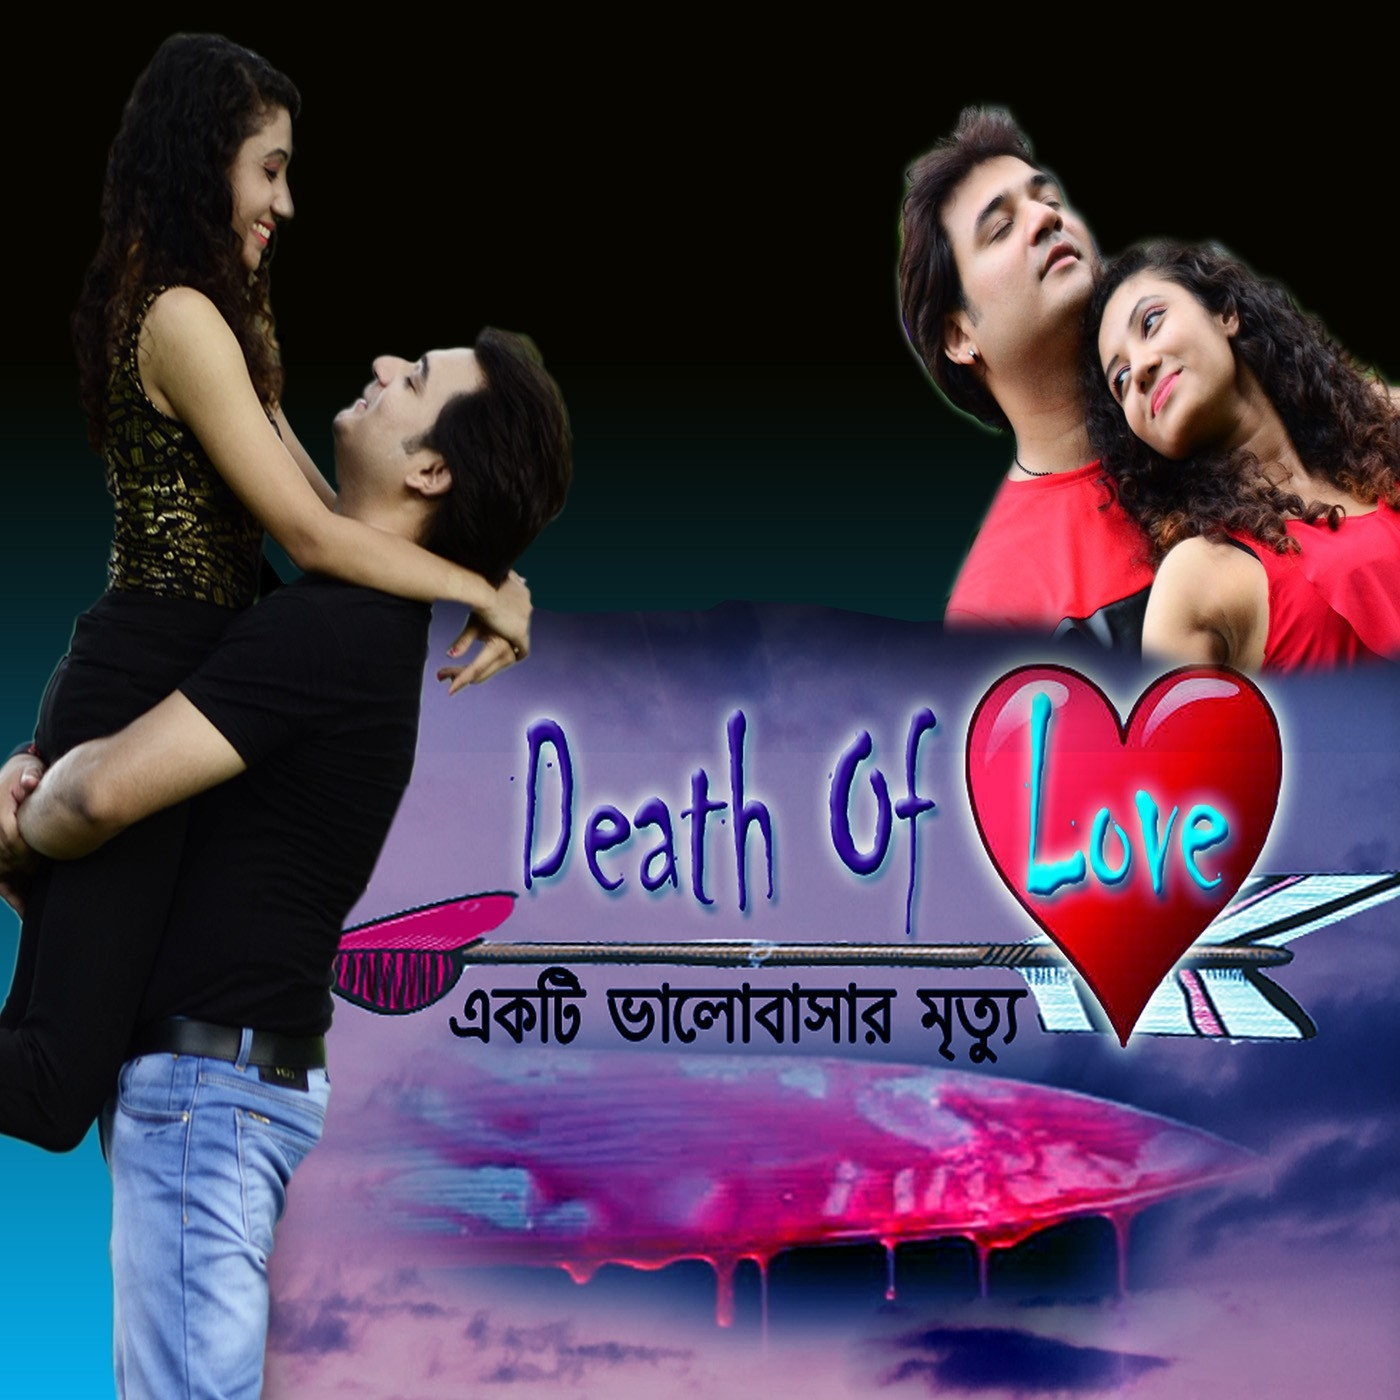 Death Of Love songs